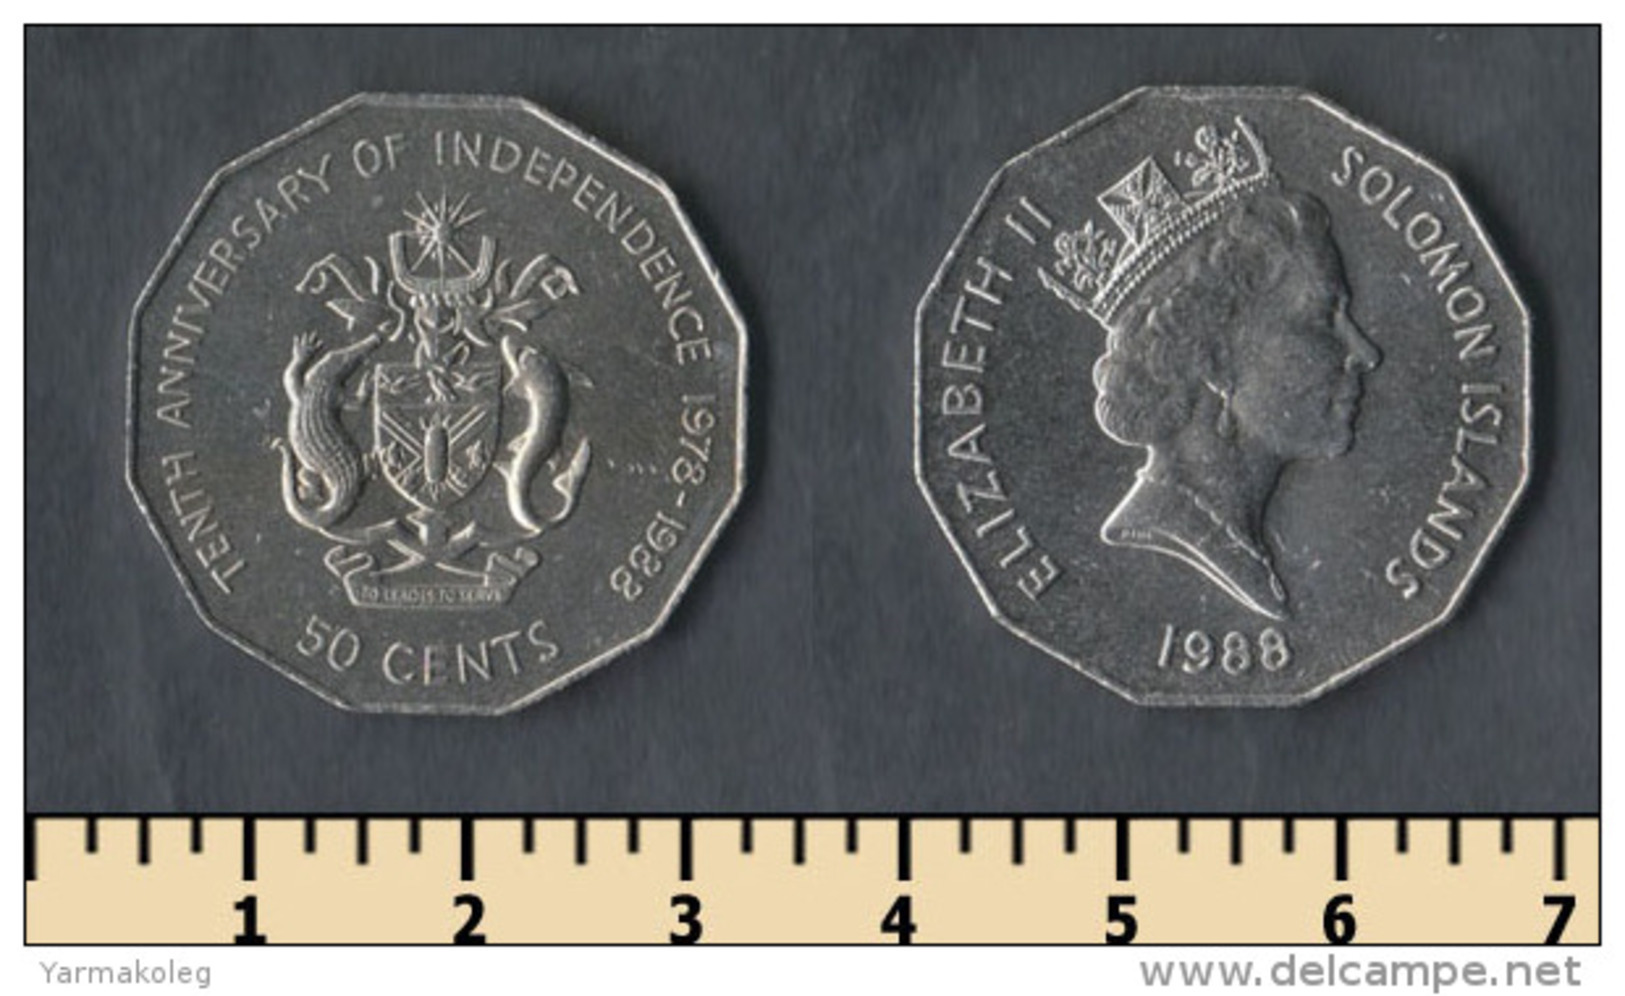 Solomon Islands 50 Cents 1988 - Salomonen